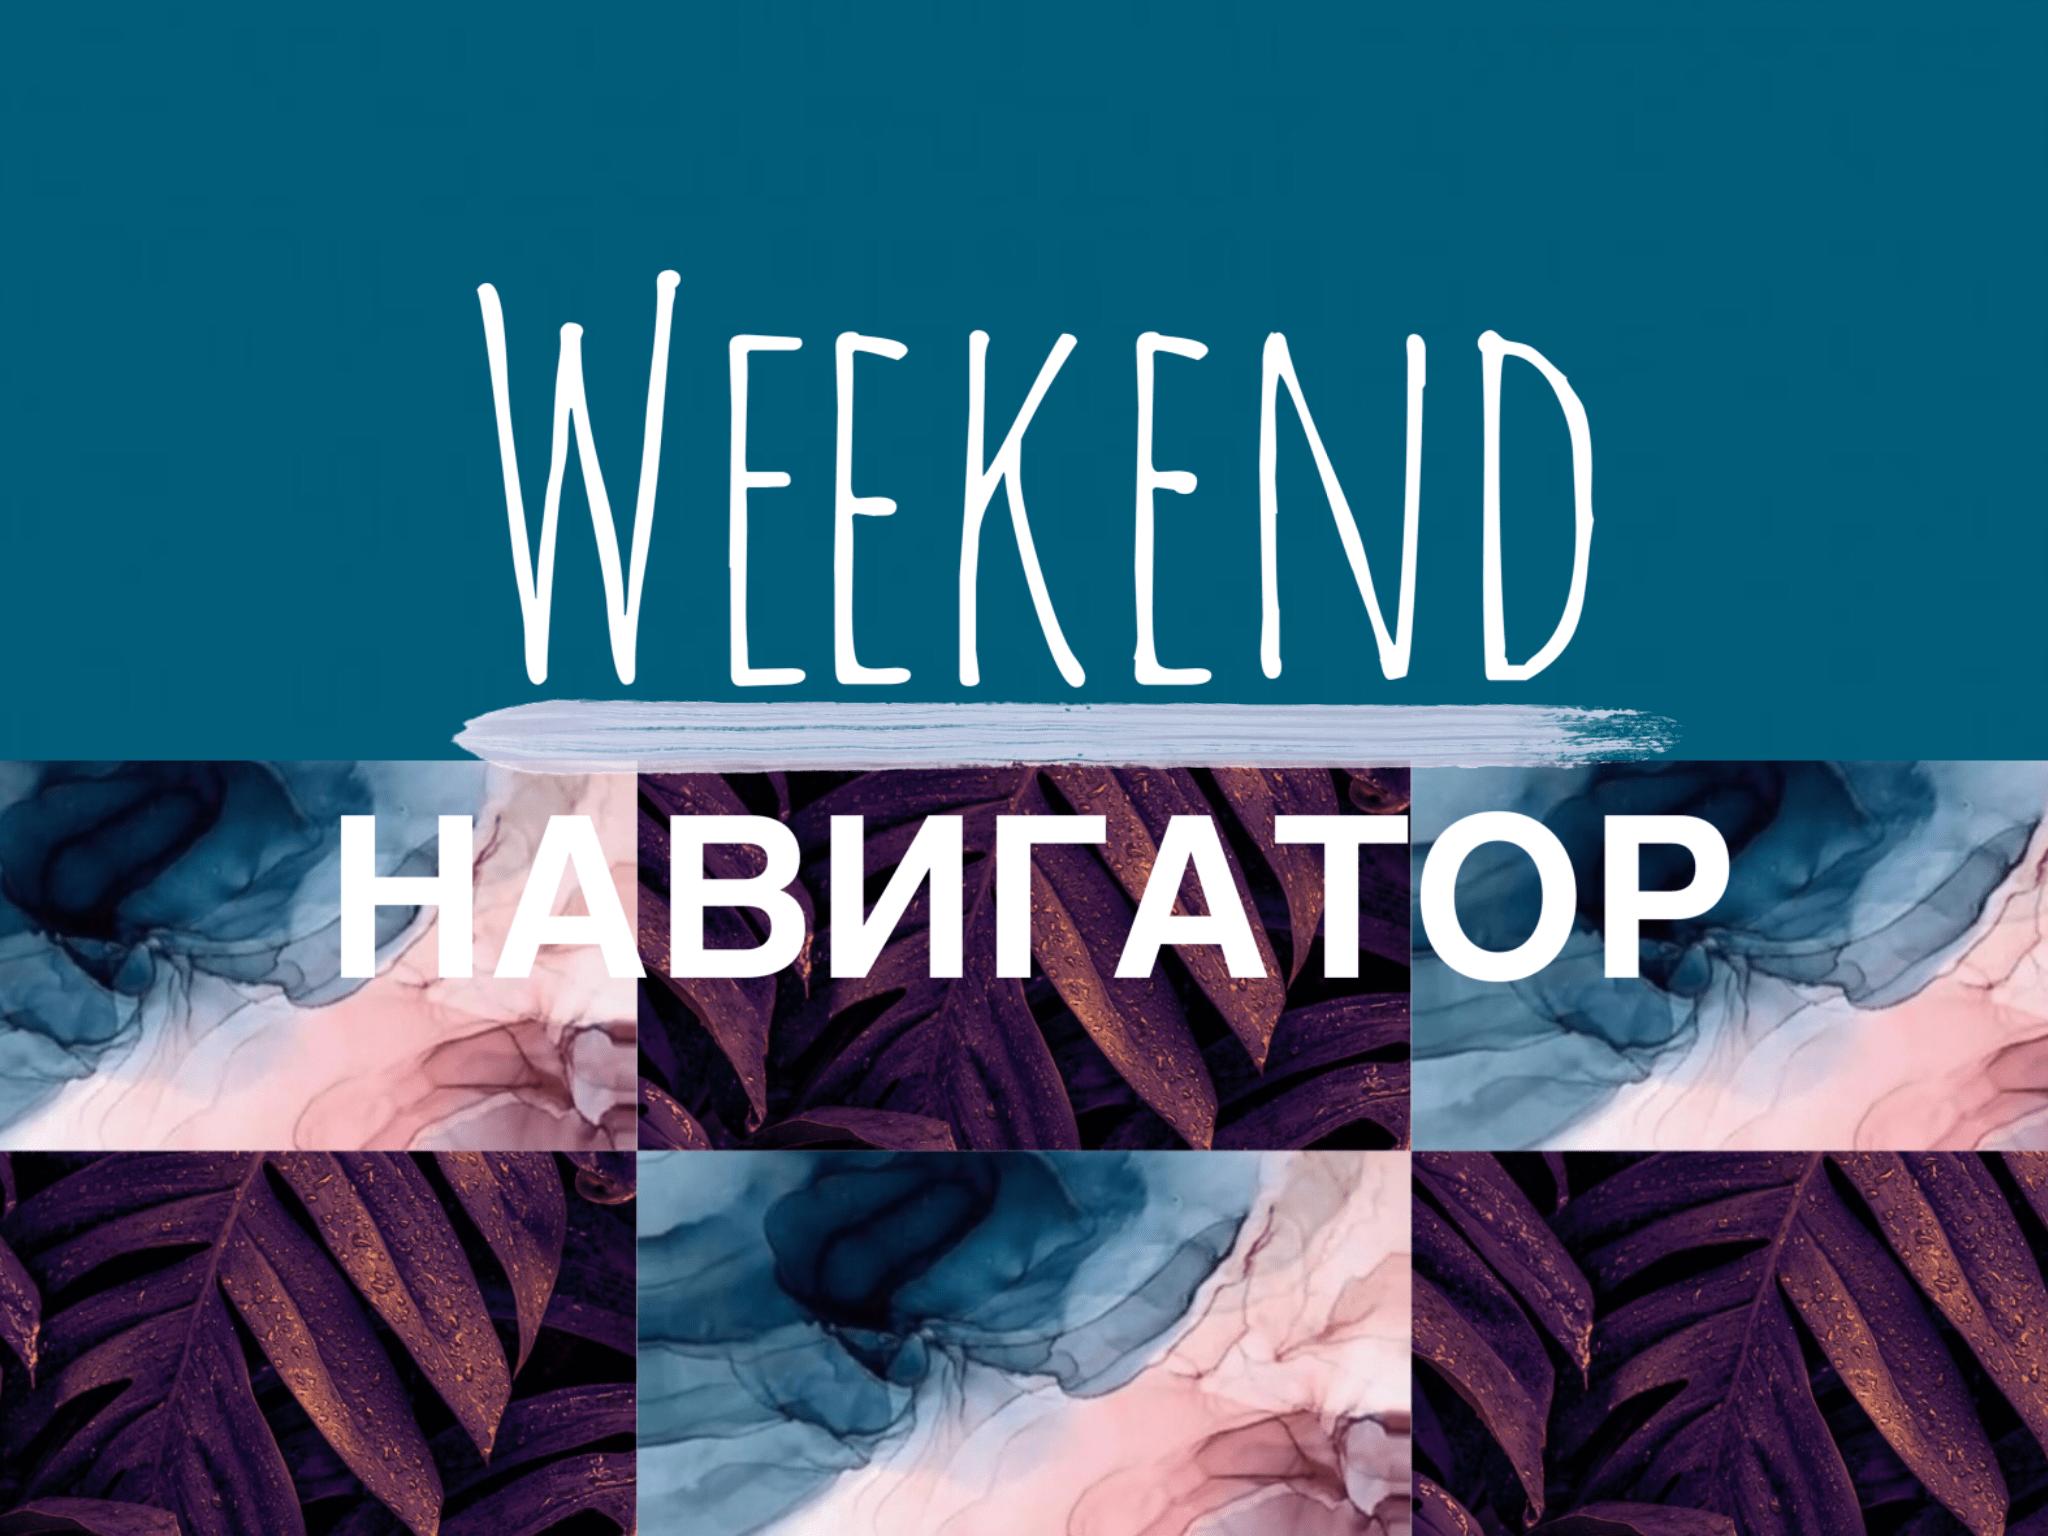 IMG 1433 WeekEnd Навигатор Weekend-Навигатор, афиша, афиша Тбилиси, выставка, Грузия, концерт, отдых, тбилиси, туризм